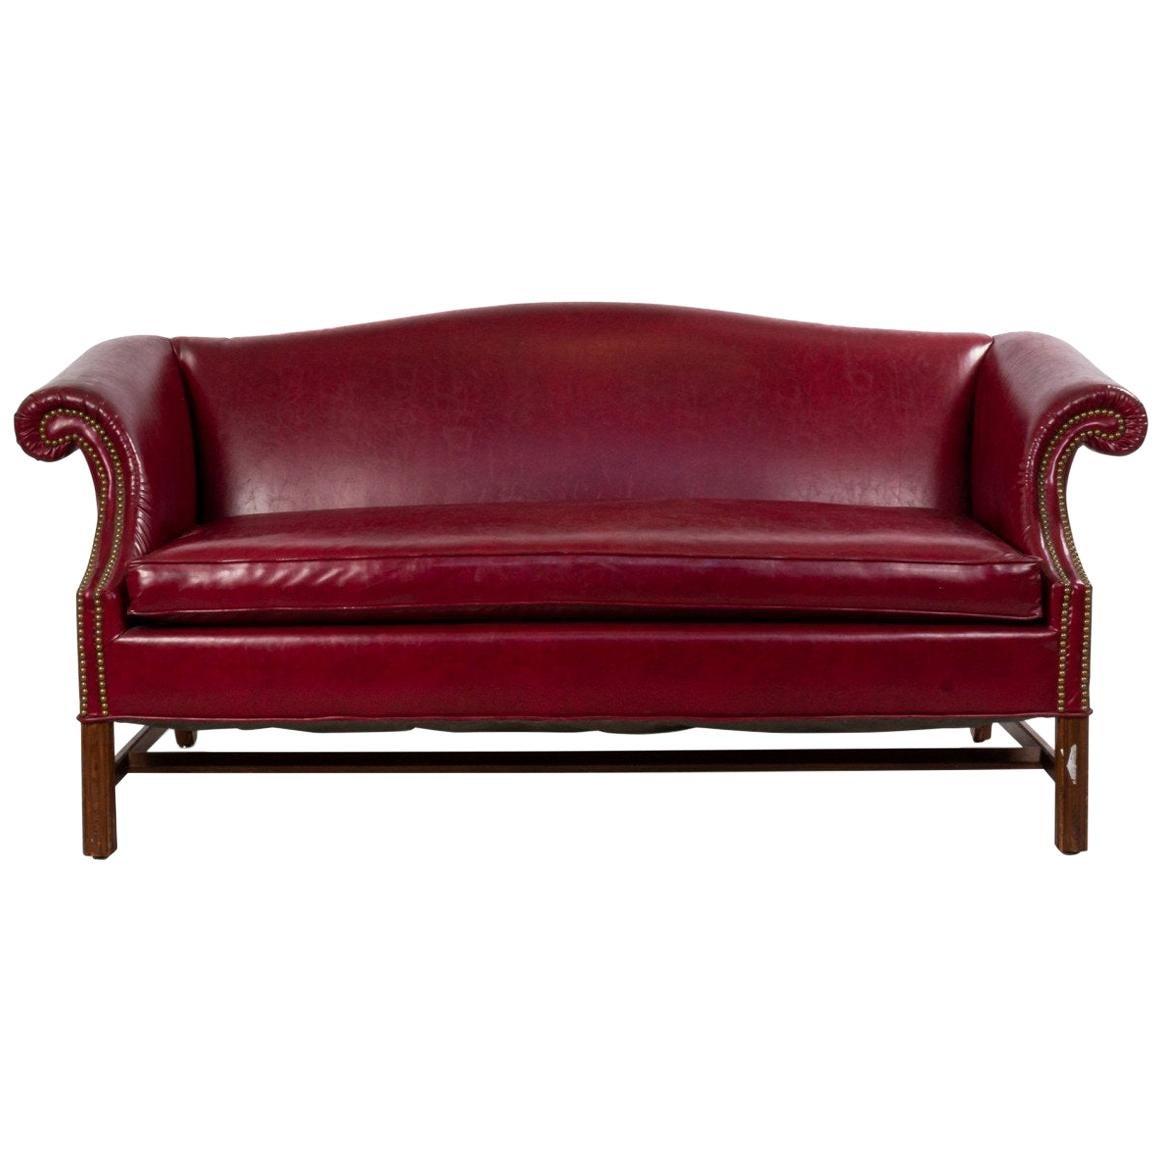 English Georgian Leather Chesterfield Sofa